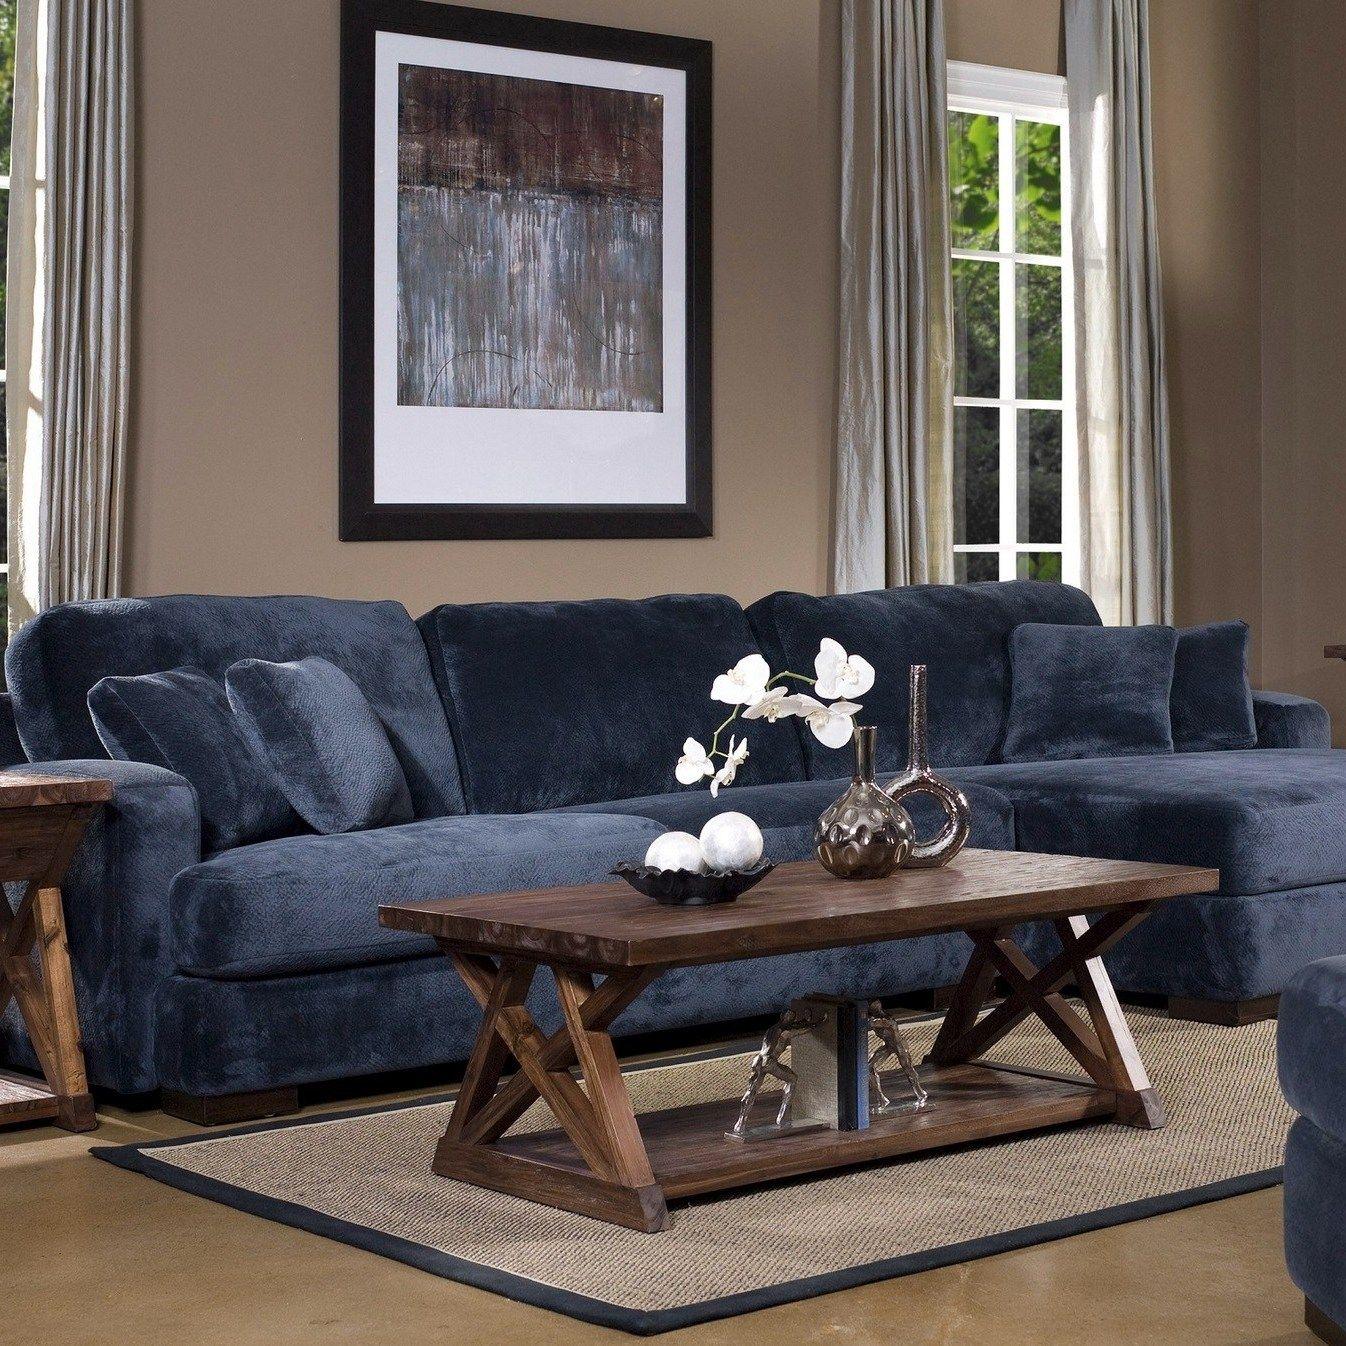 15 Beautiful Dark Blue Wall Design Ideas   Brown living room, Living room grey, Living room paint